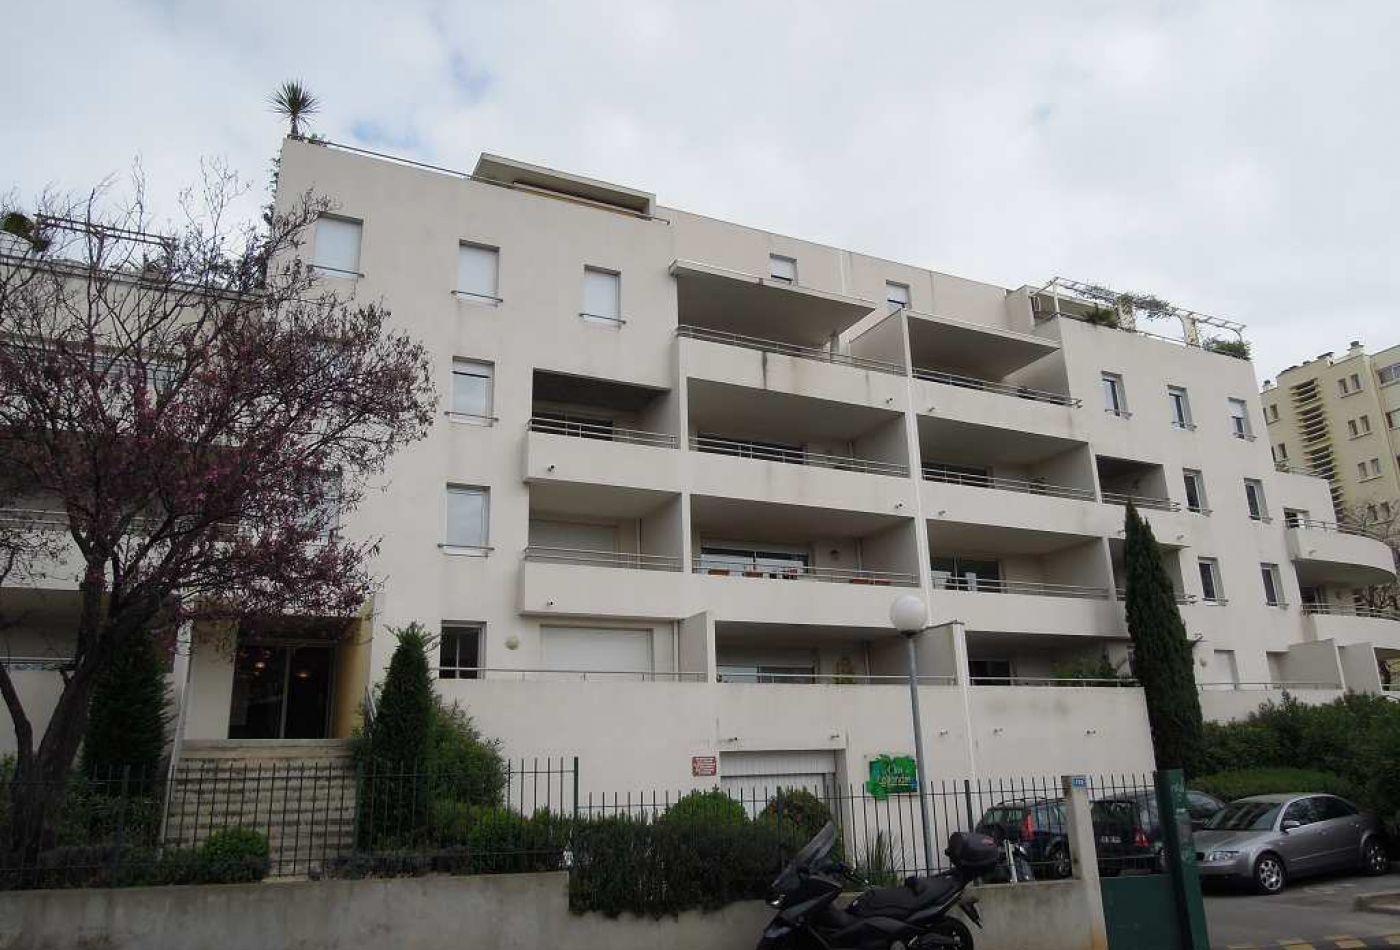 Garage en location montpellier rf 341681961 frances for Site immobilier location